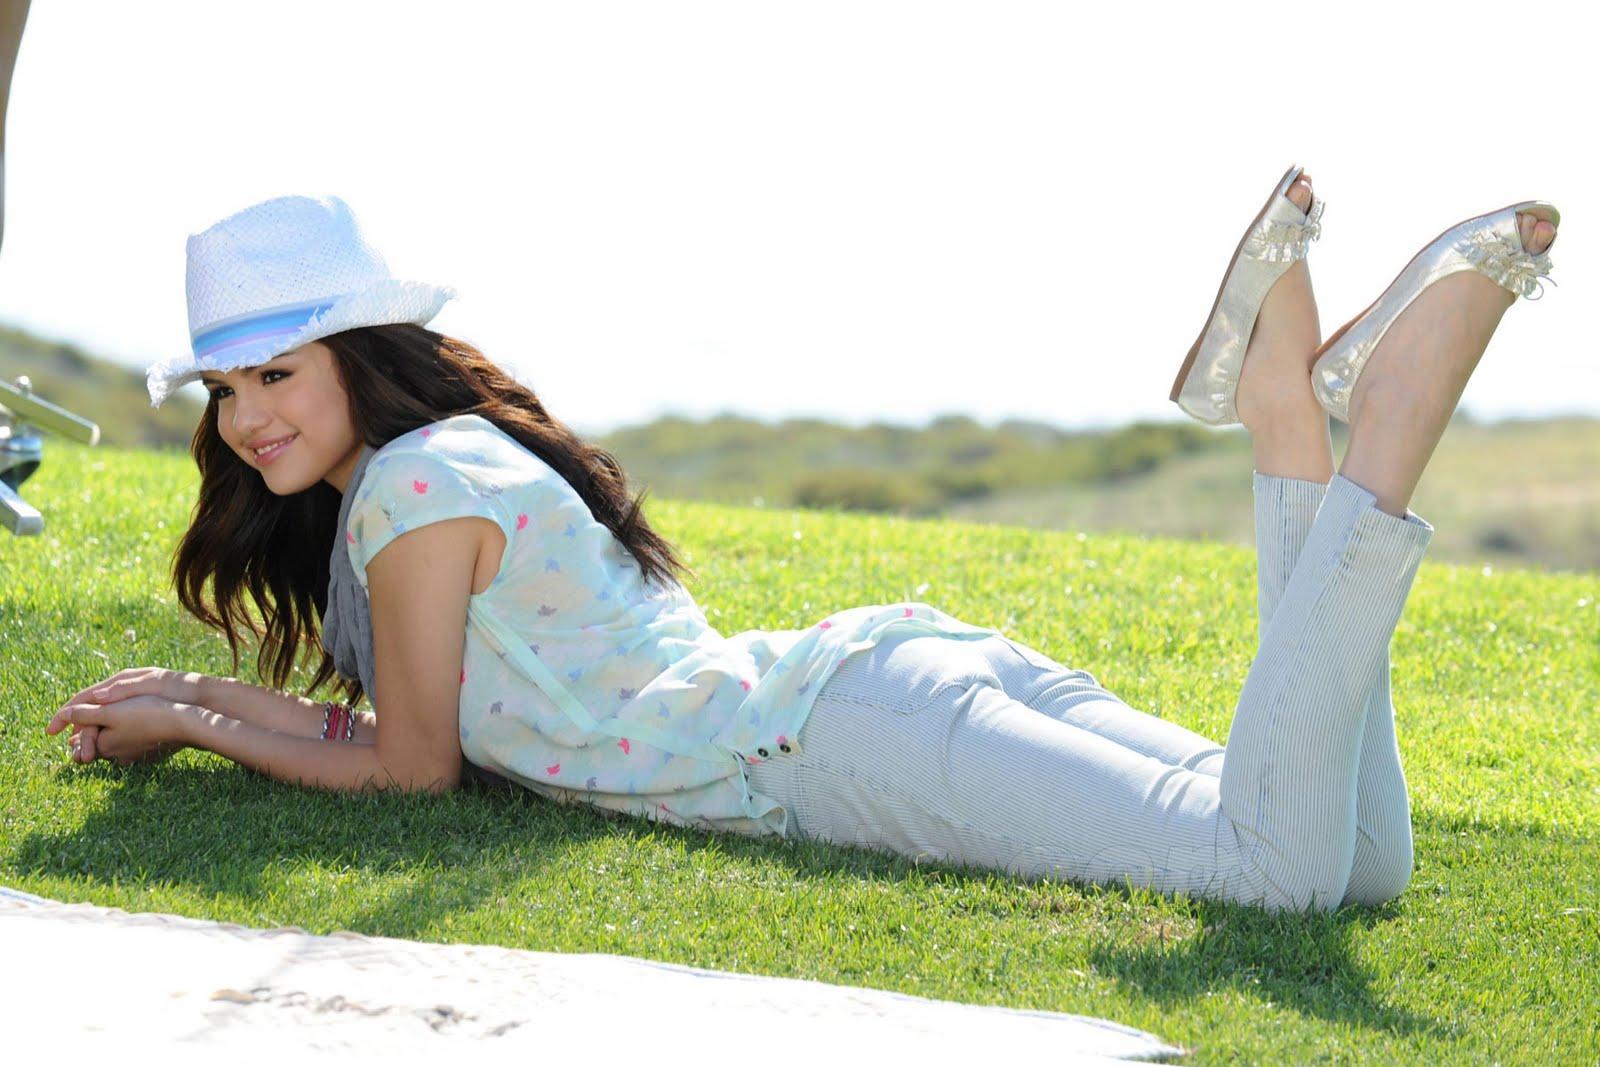 http://3.bp.blogspot.com/_yberMRekEGc/TT0vINubKAI/AAAAAAAANQw/oHPrqKzxXjk/s1600/Selena%2BGomez%2B2-09.jpg